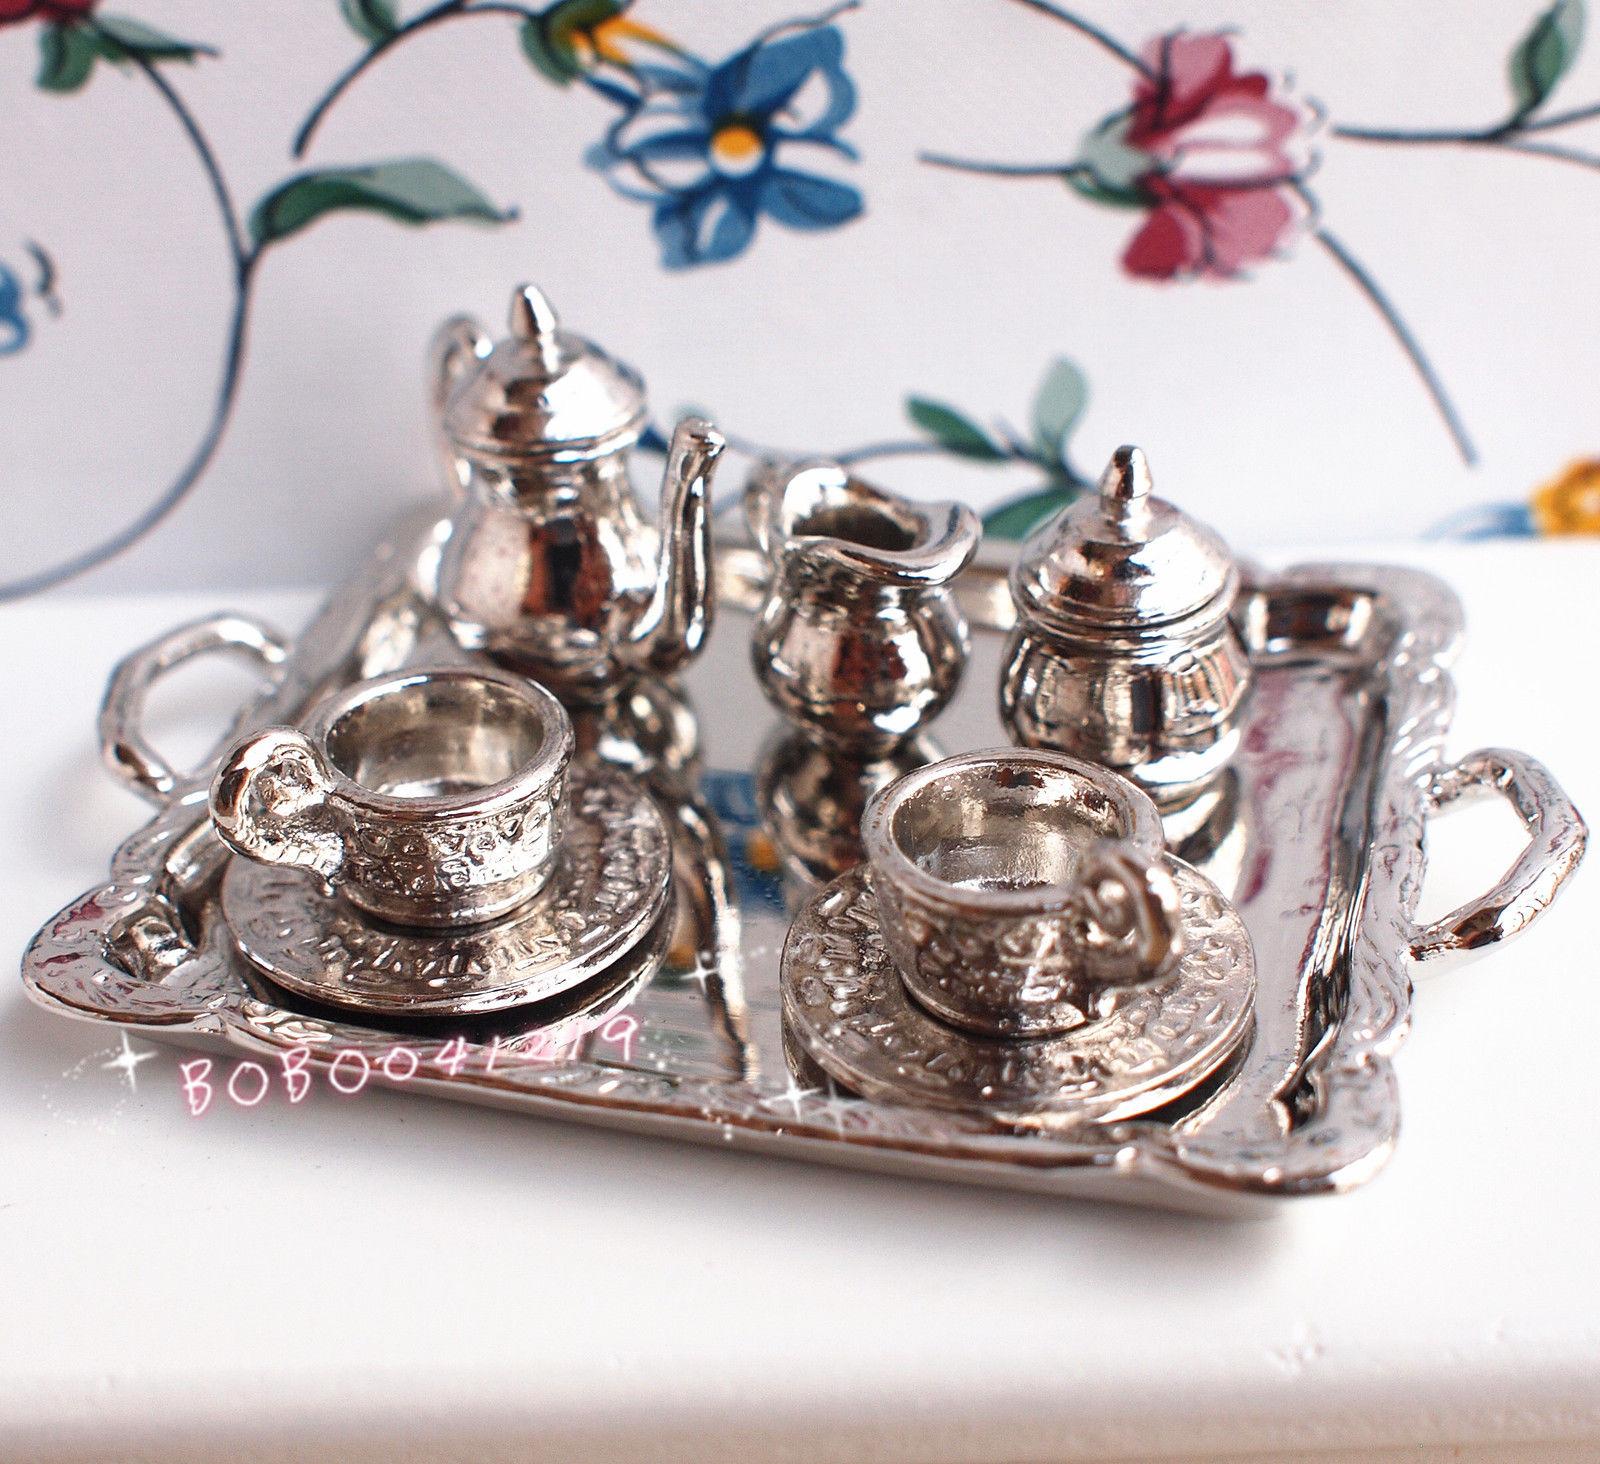 Small Crop Of Silver Tea Set